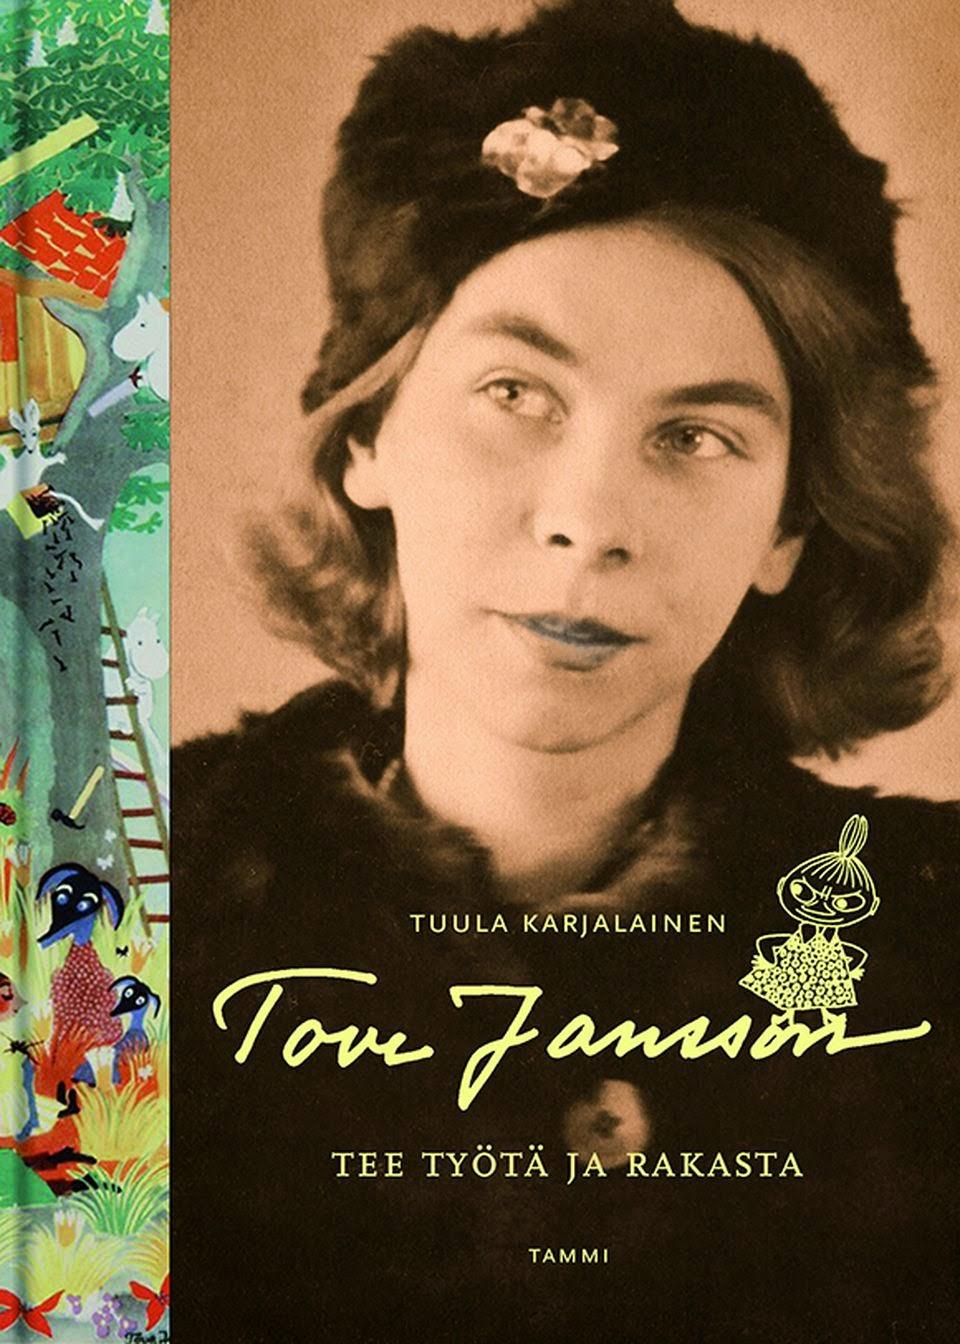 Helena Halme Author: Tove Jansson at the Ateneum Art ...